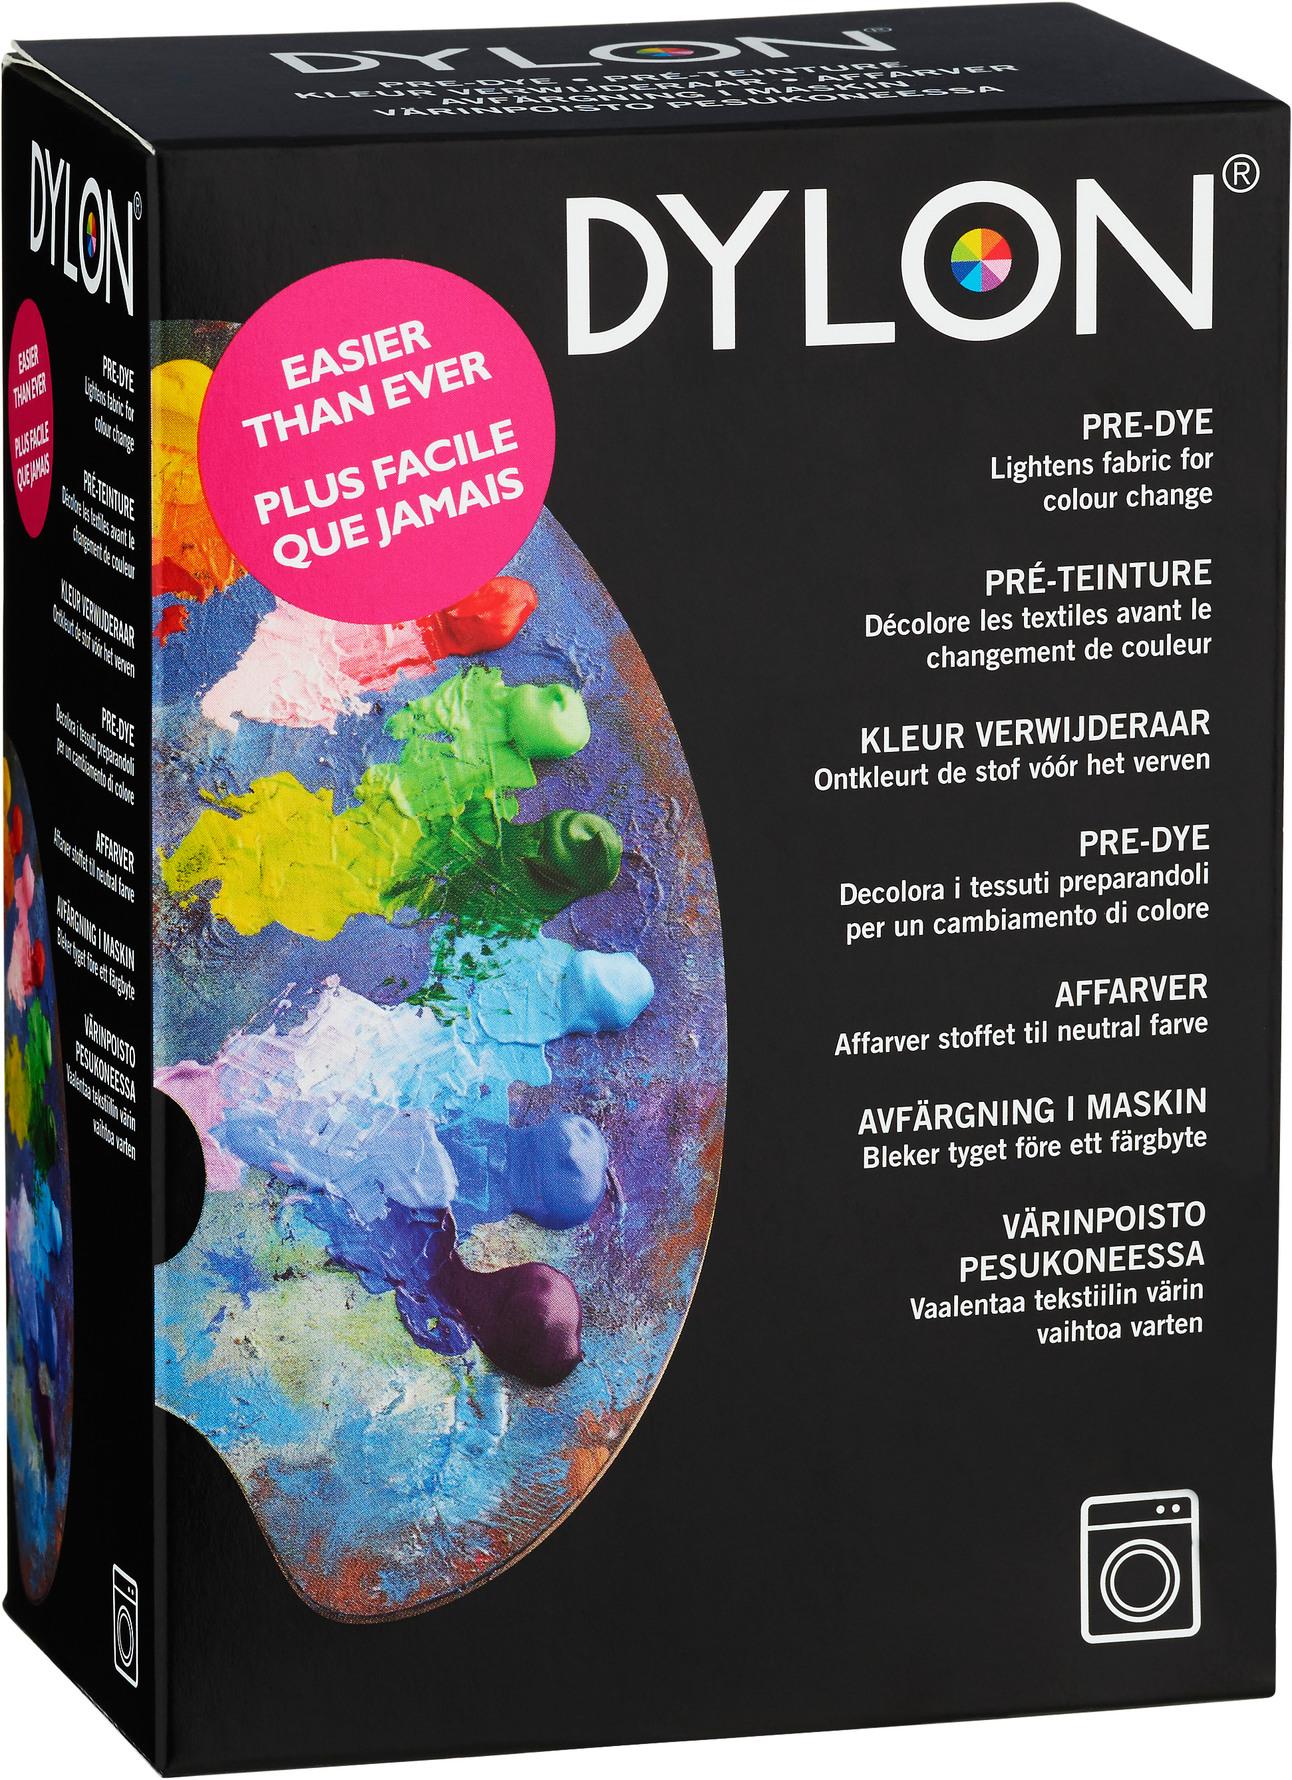 Dylon farve